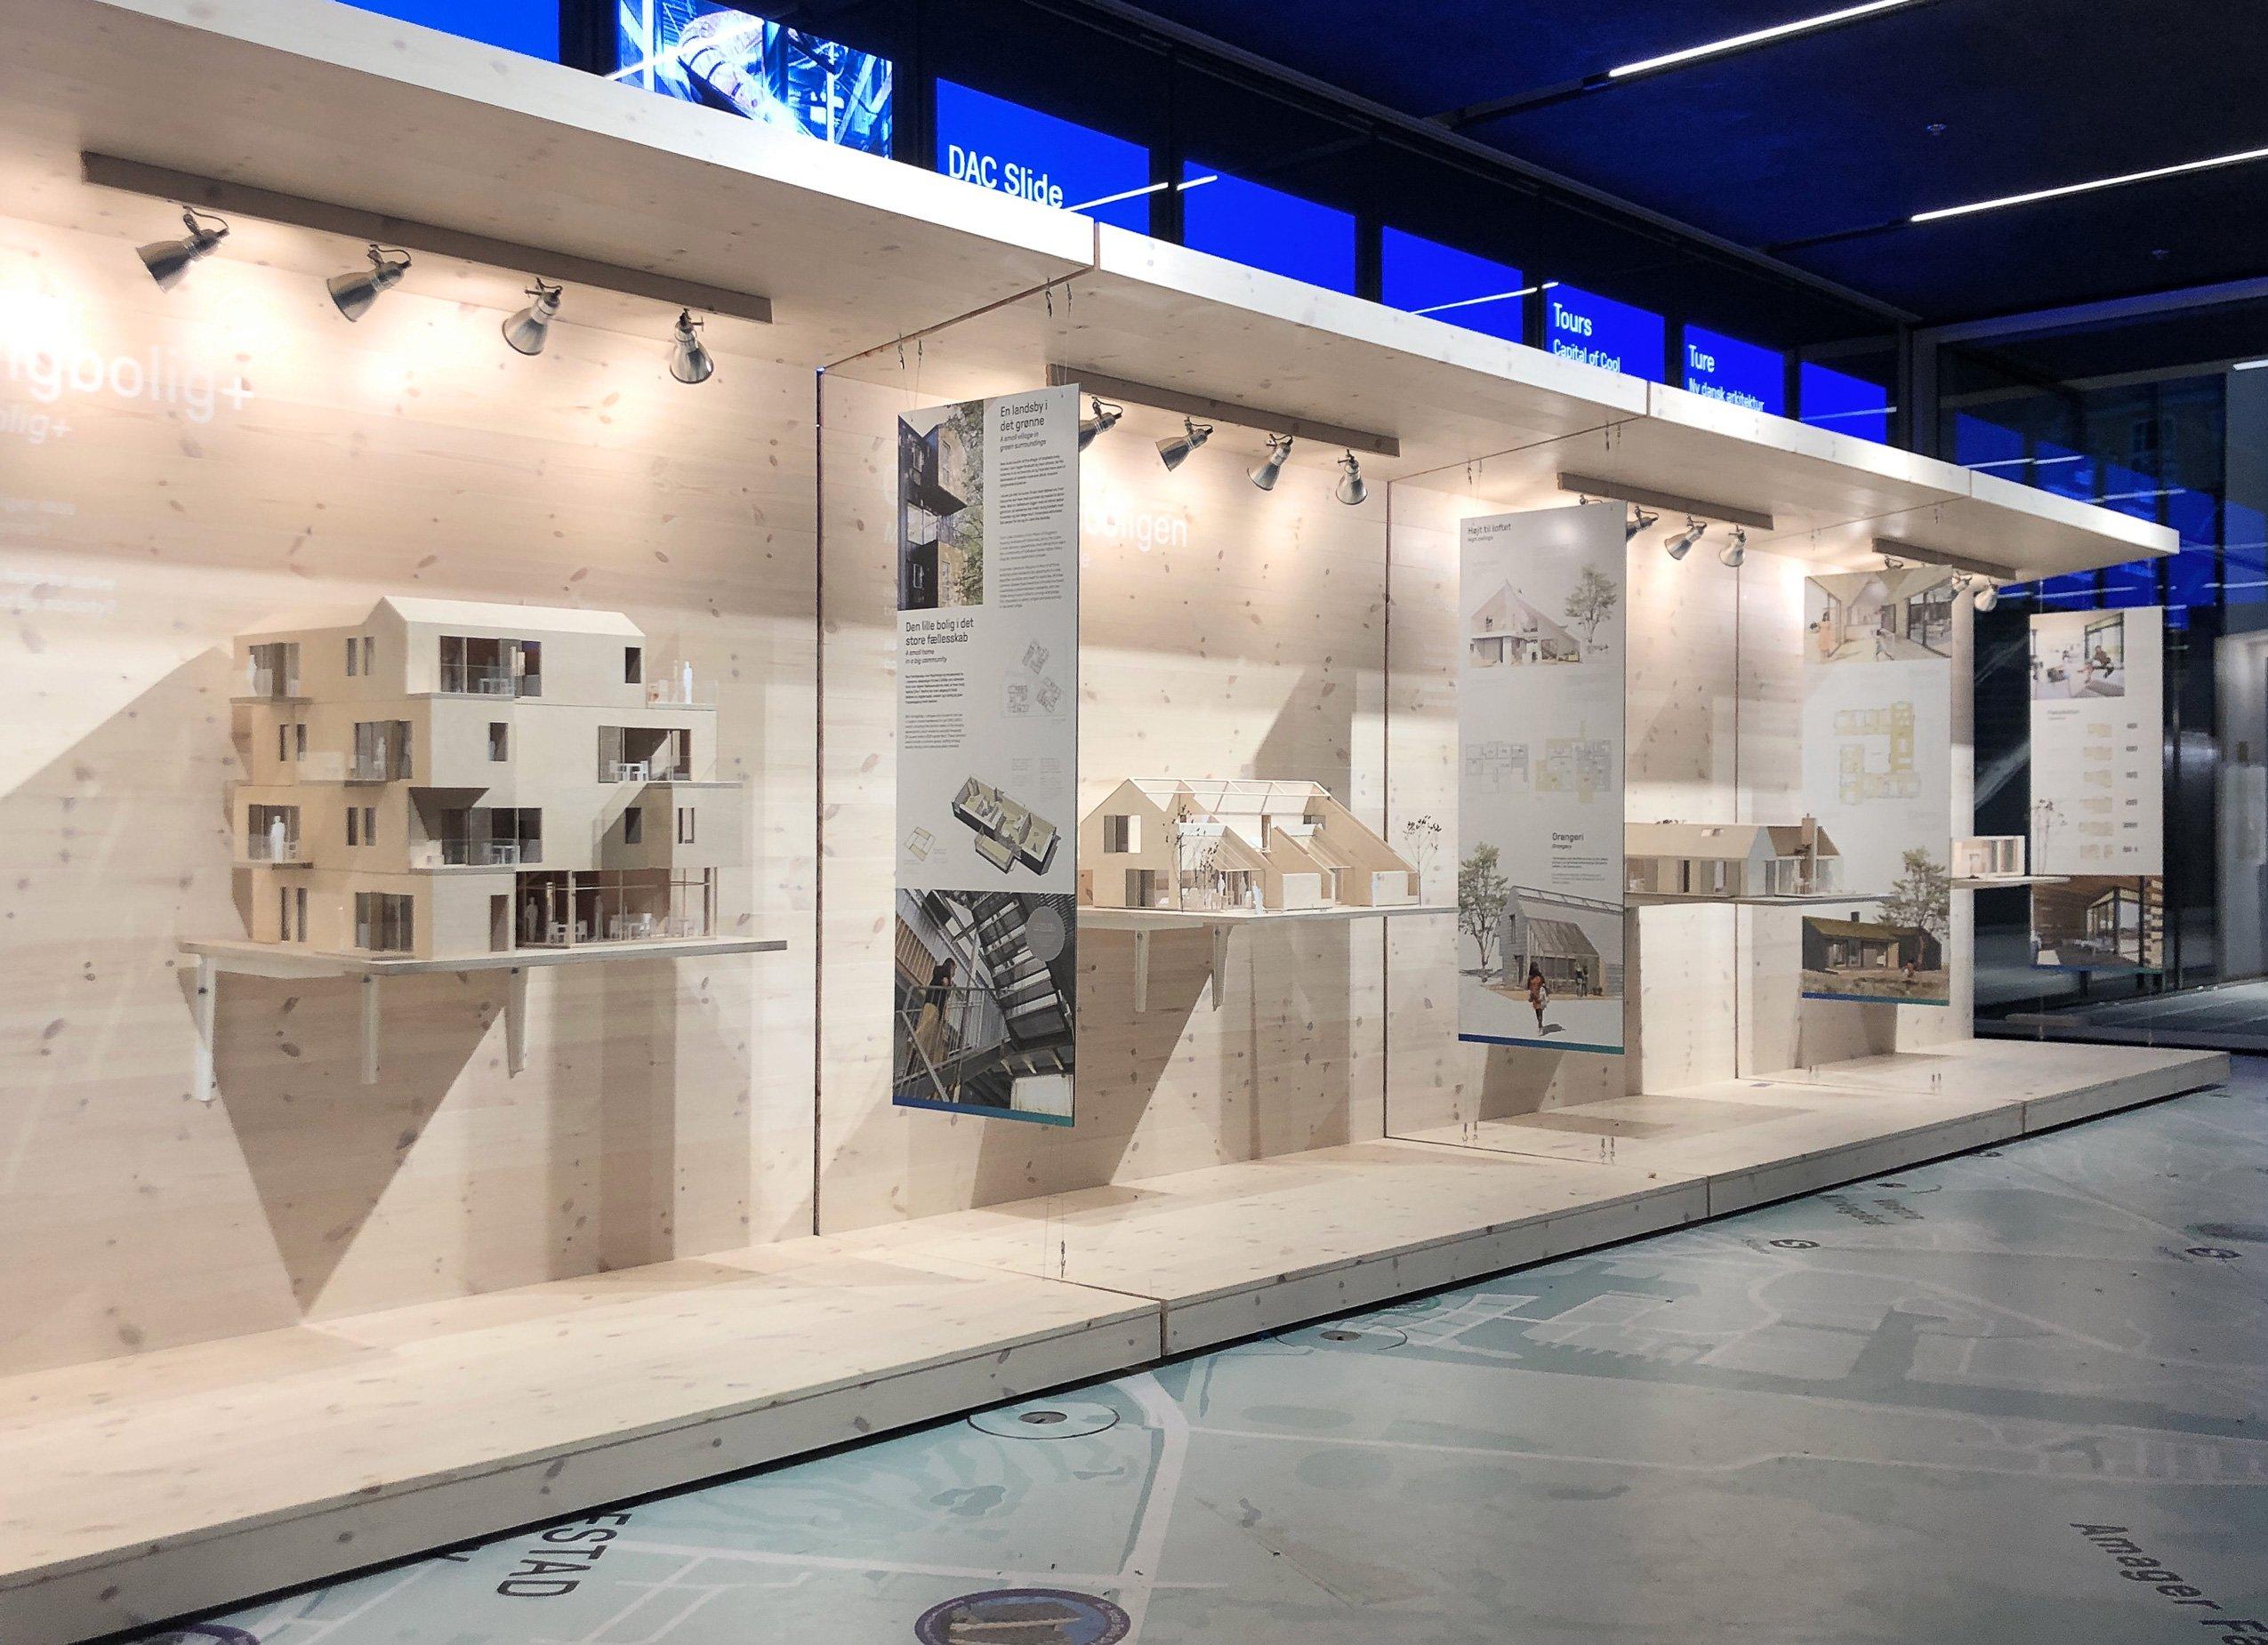 7-meningsfulde-boliger-ONV-arkitekter-DAC-udstilling-Dansk-Arkitekturcenter-Blox